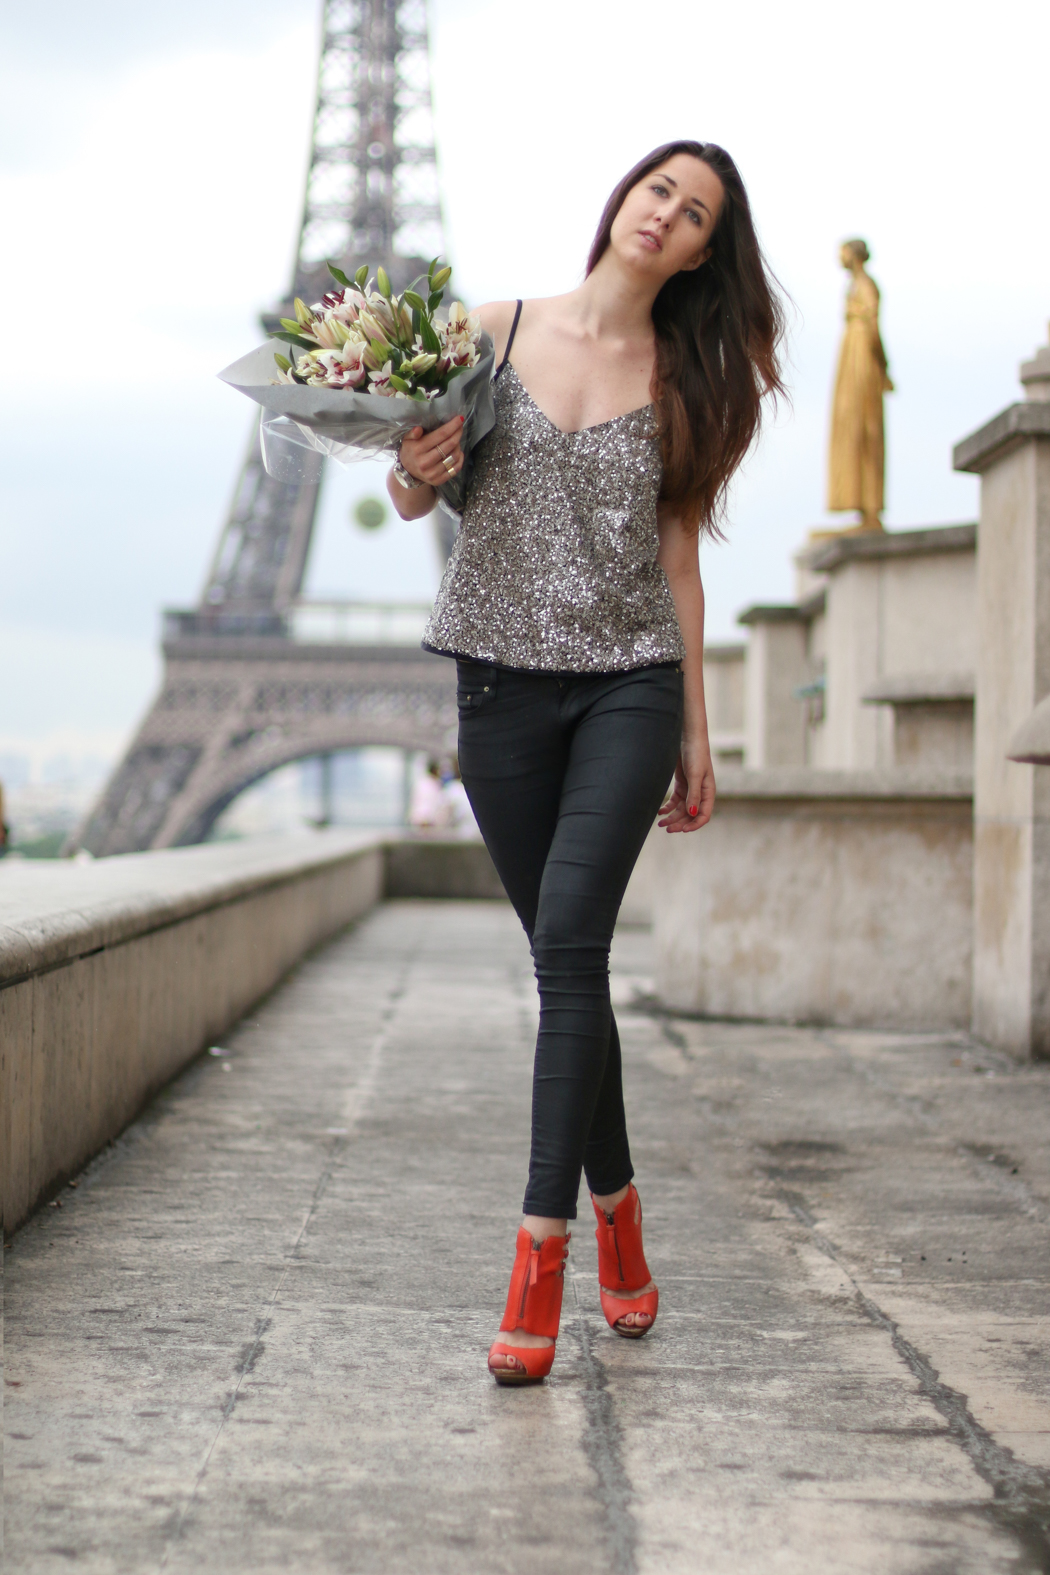 Lindarella-Fashionblogger-Buffalo-Eiffelturm-München-Paris-9